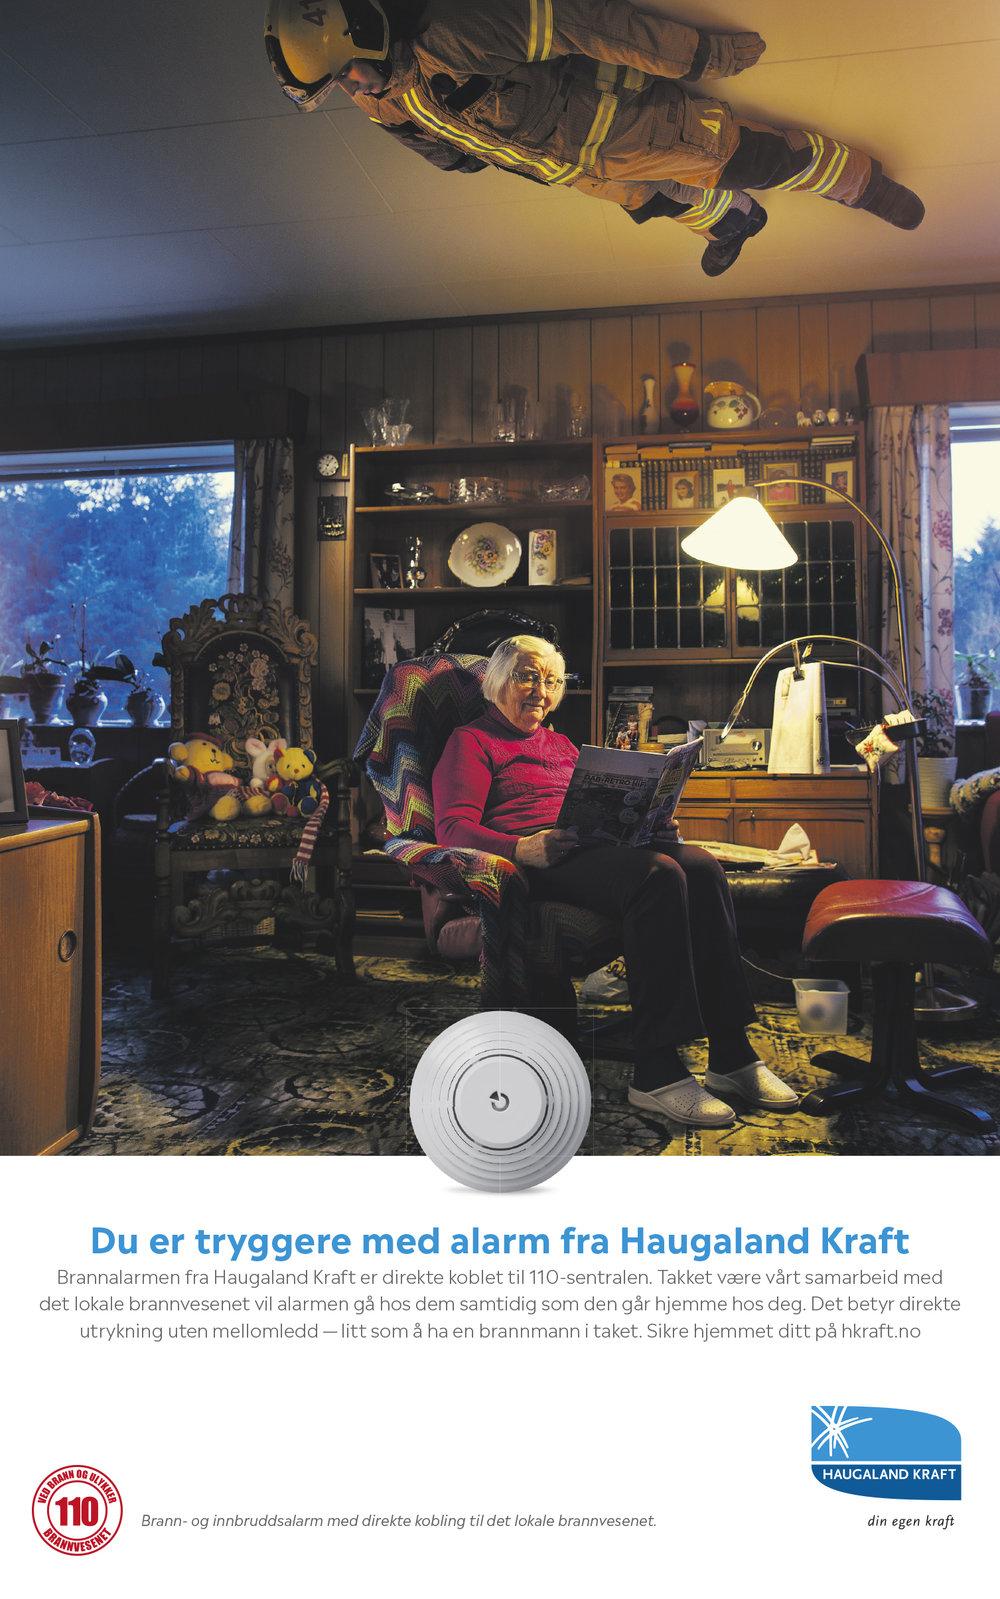 HaugalandKraft_Alarm_Helside_246x365_Trykk 1.jpg